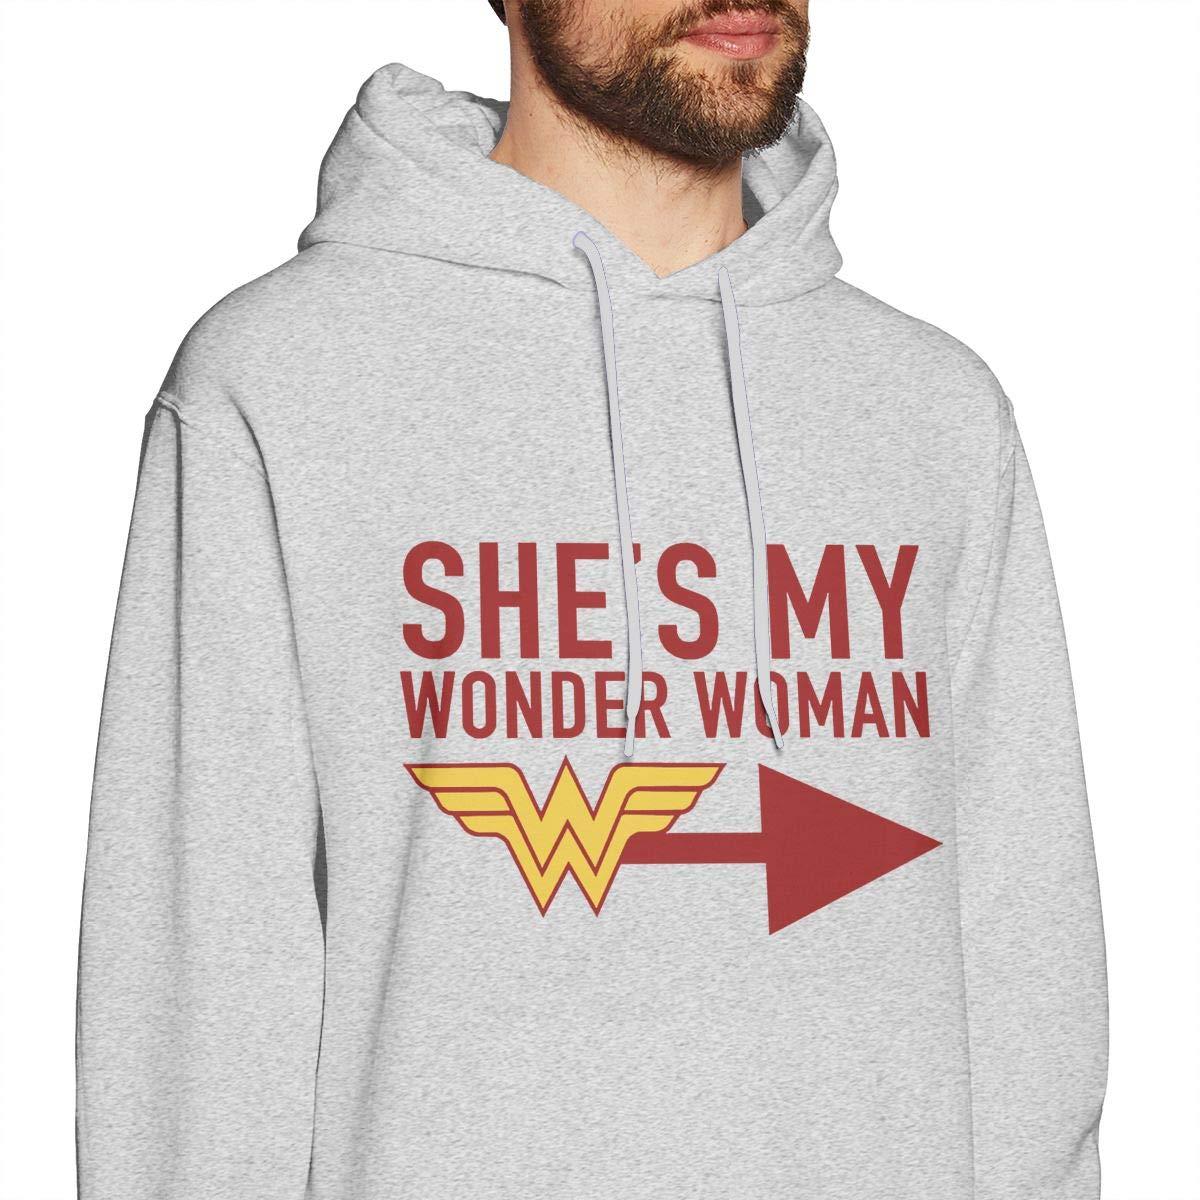 UESEU Mens Fashion Solid Color Hooded Long-Sleeve Drawstring Shes My Wonder Woman Hooded Sweatshirt